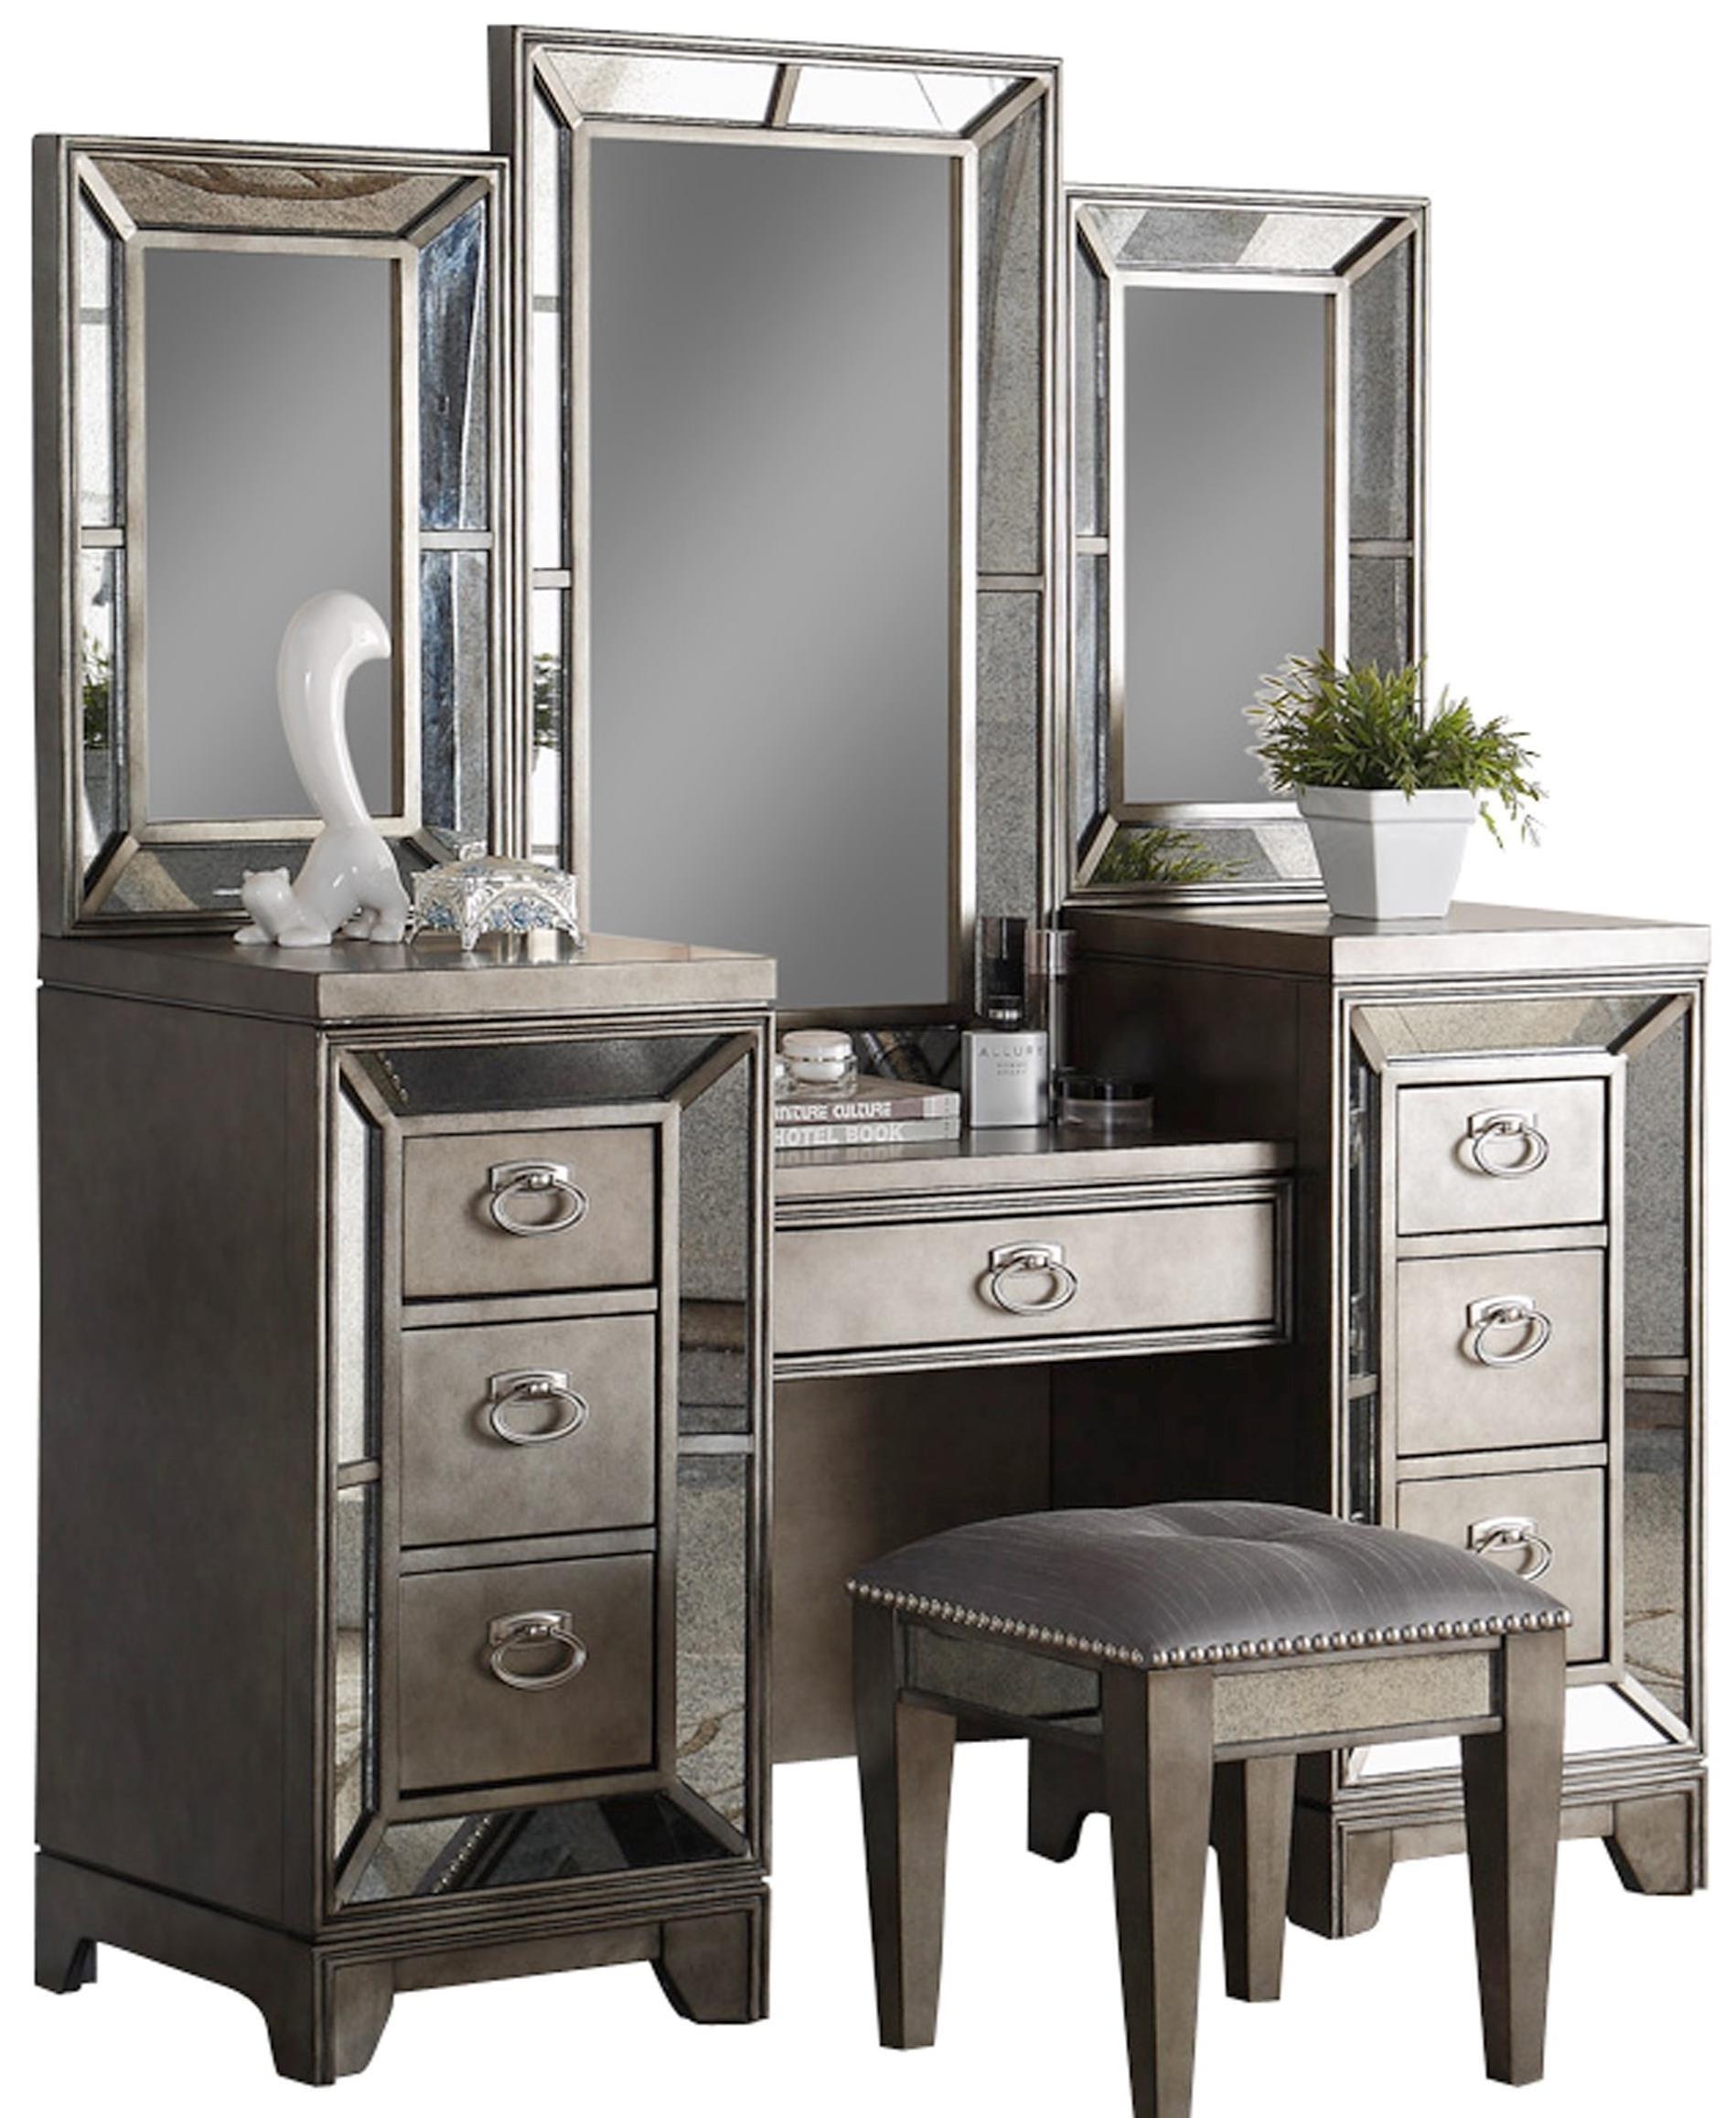 Avalon Furniture Lenox Antique Mirror Vanity